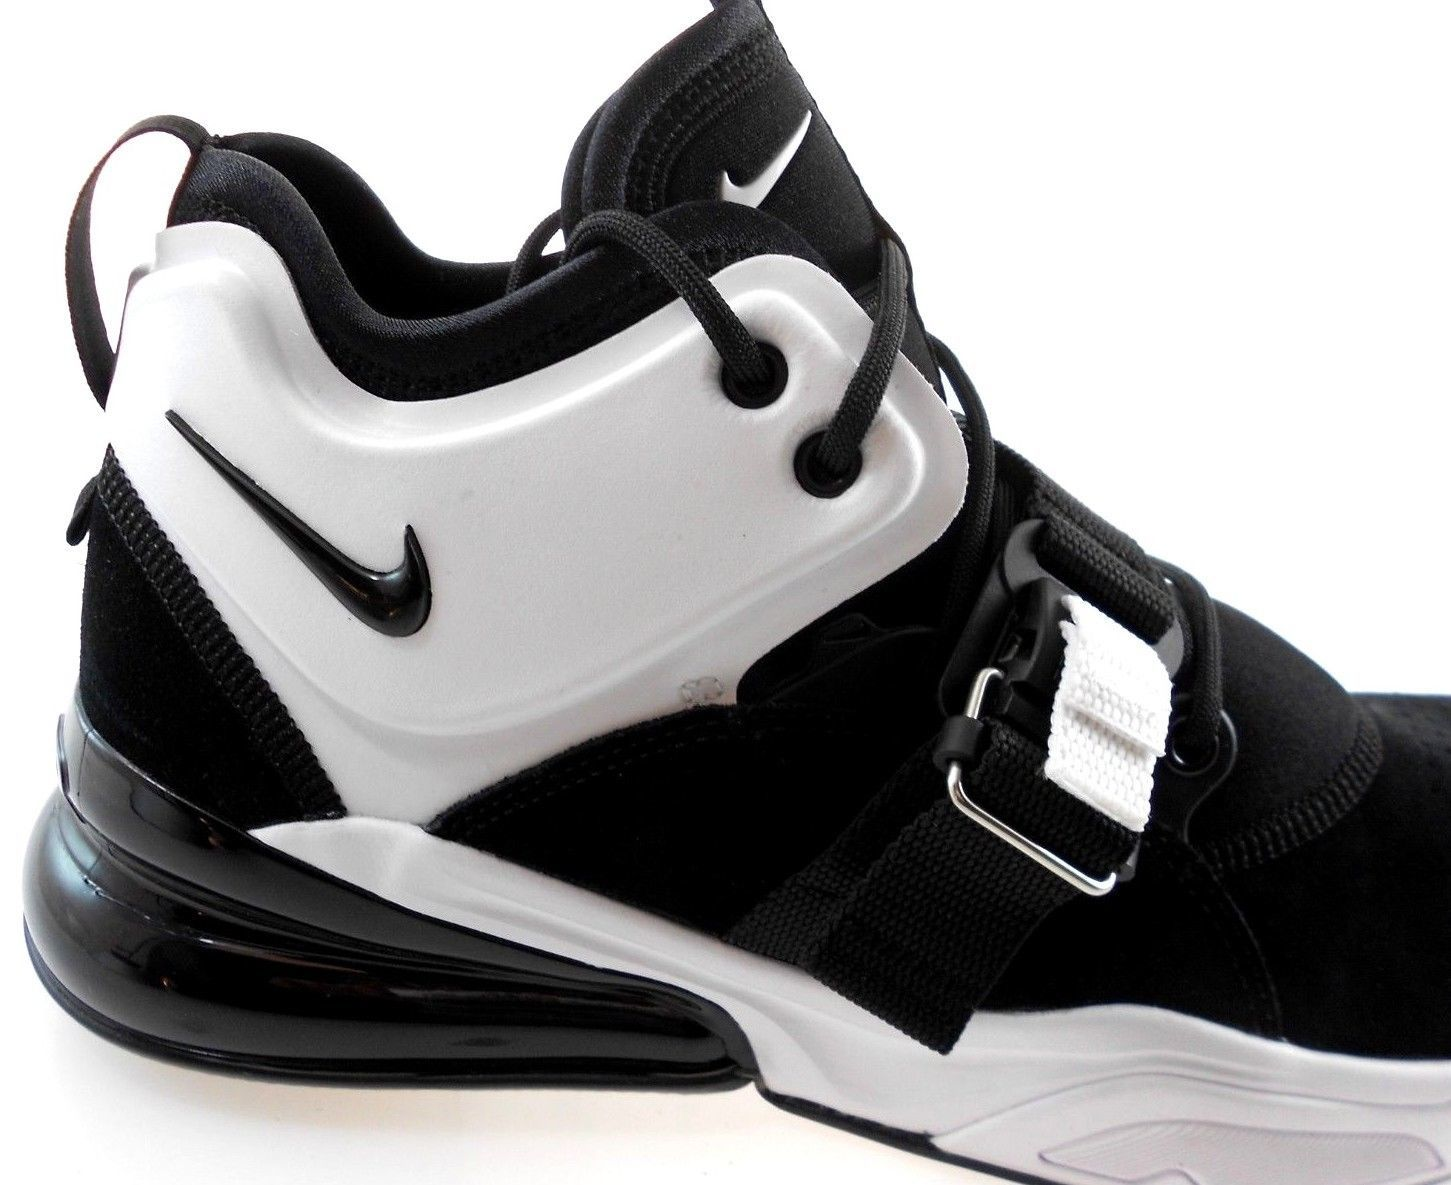 bca10724ac57 Nike Air Force 270 Men s BLACK WHITE Shoes